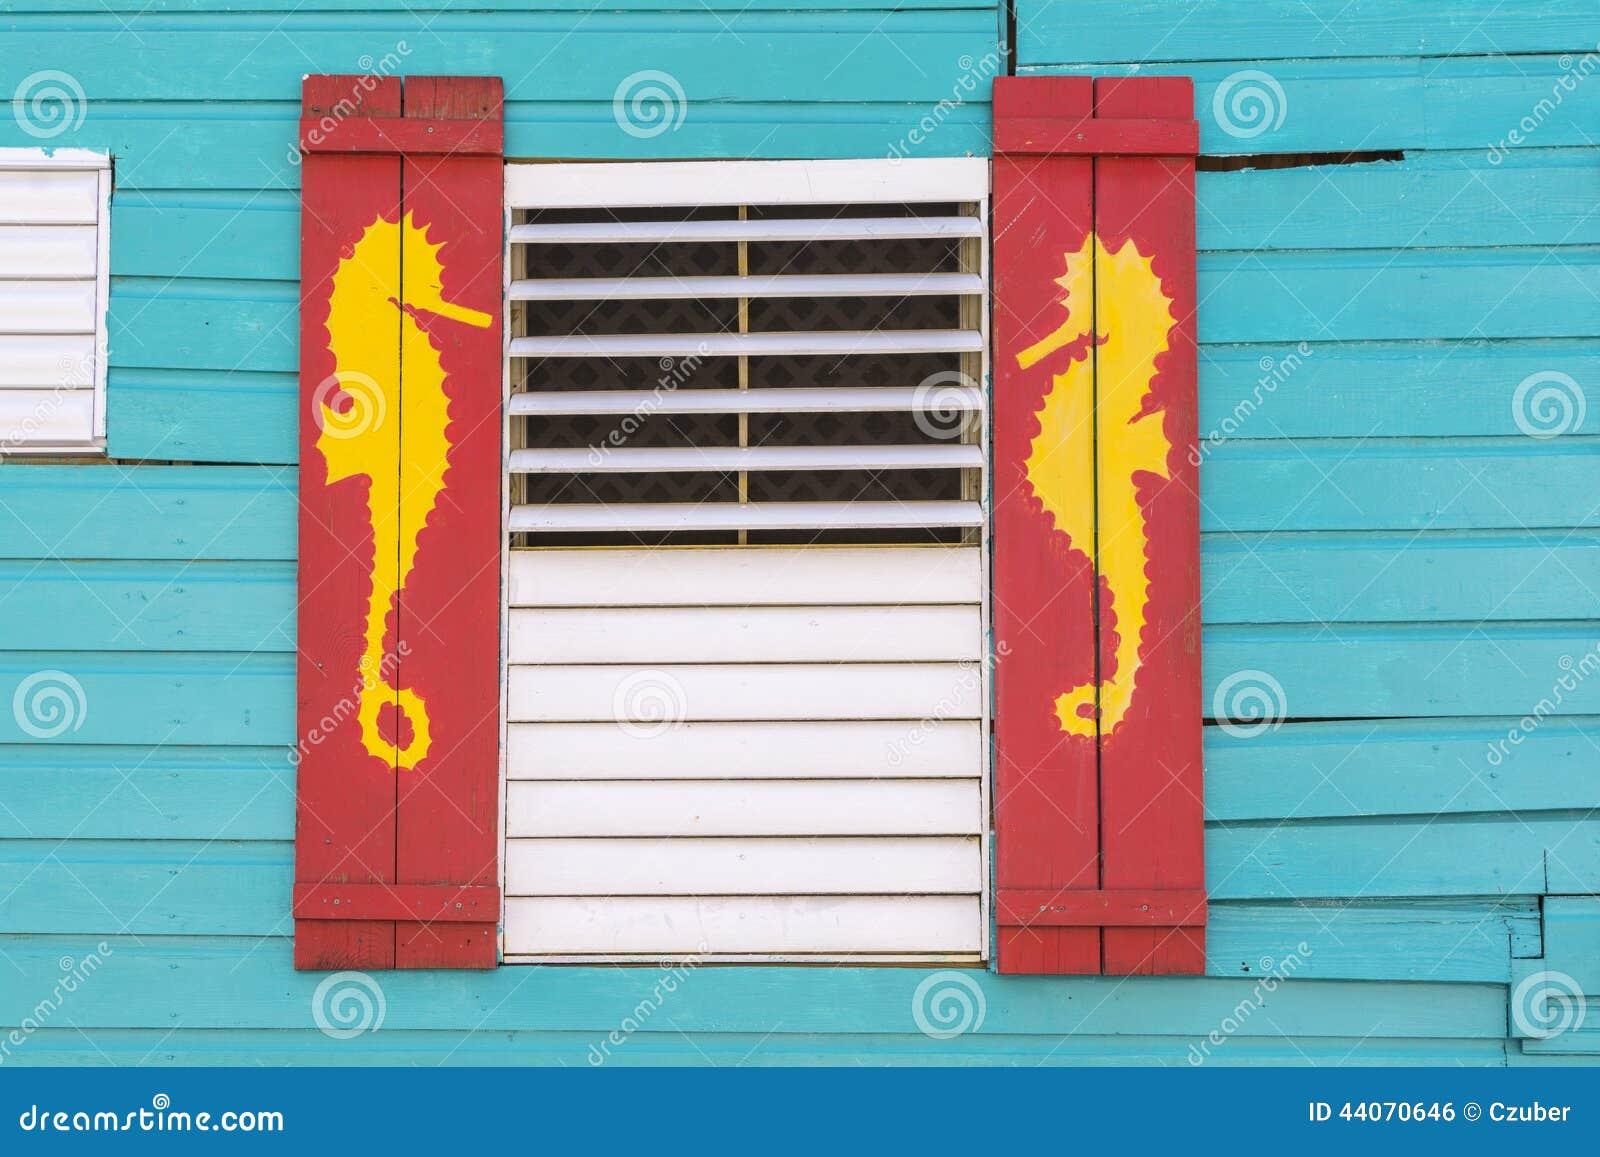 Caribbean Style Window With Sea Horse Design Stock Photo